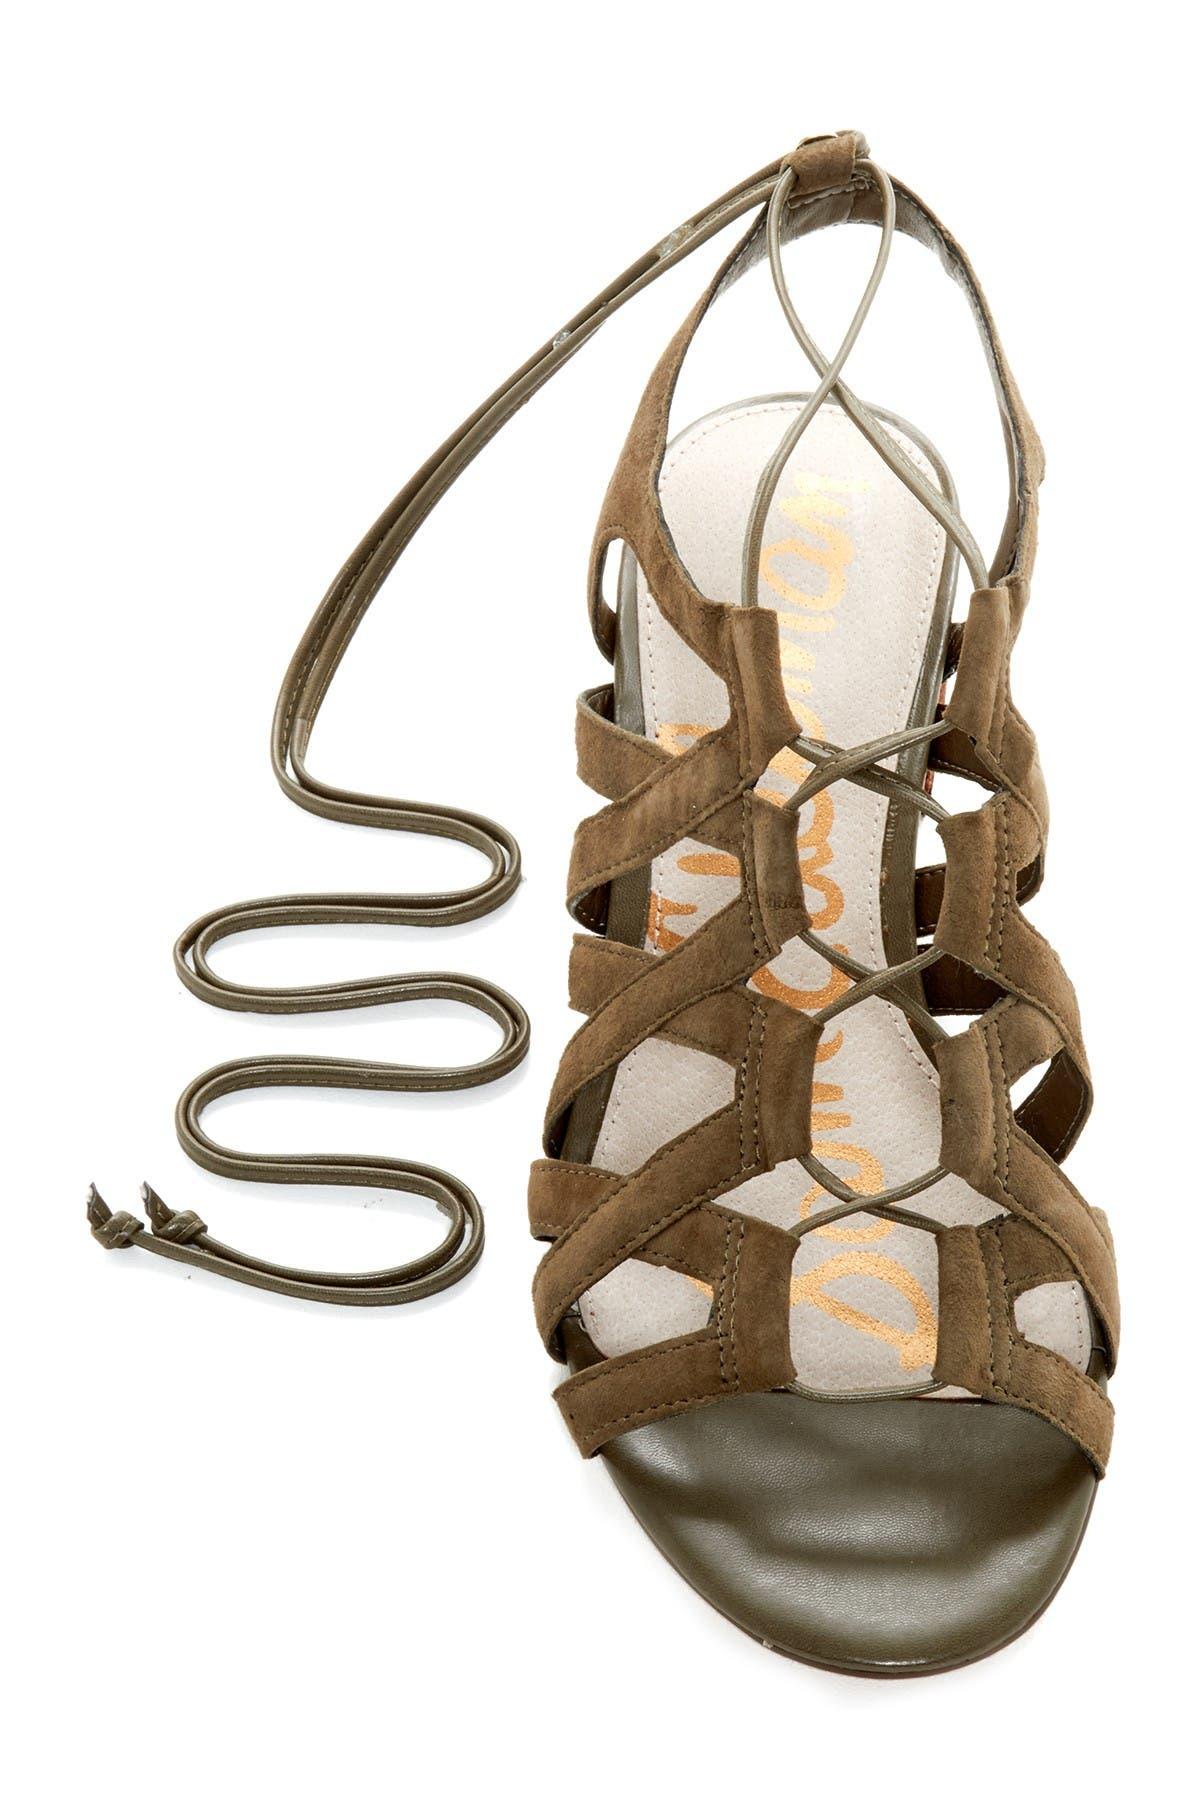 Image of Sam Edelman Ardella Lace-Up Suede Sandal